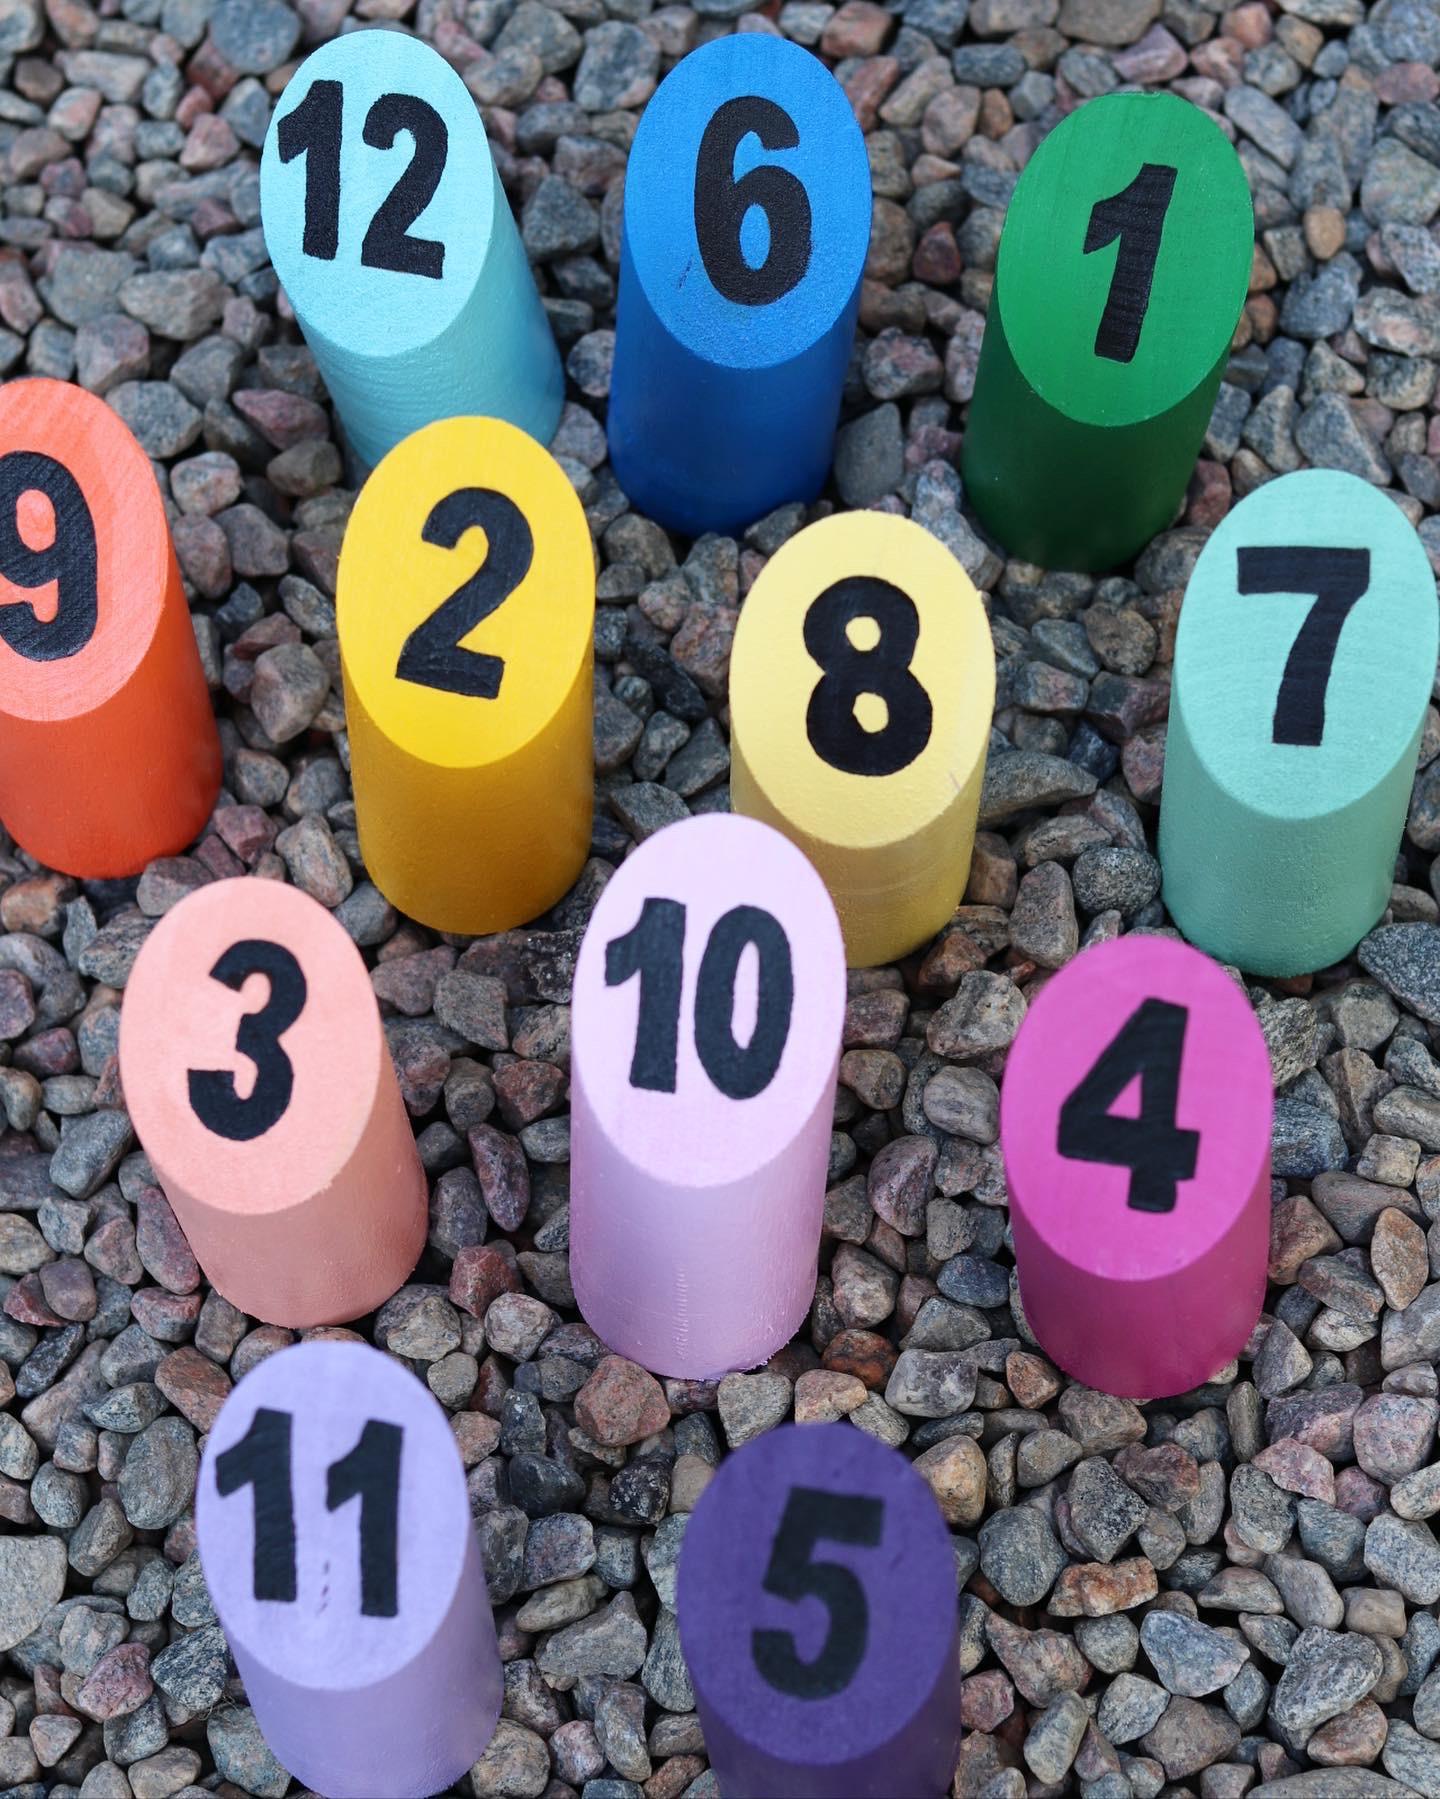 e9ecd4f4-5f62-4ff1-87c4-0e8a956e062f